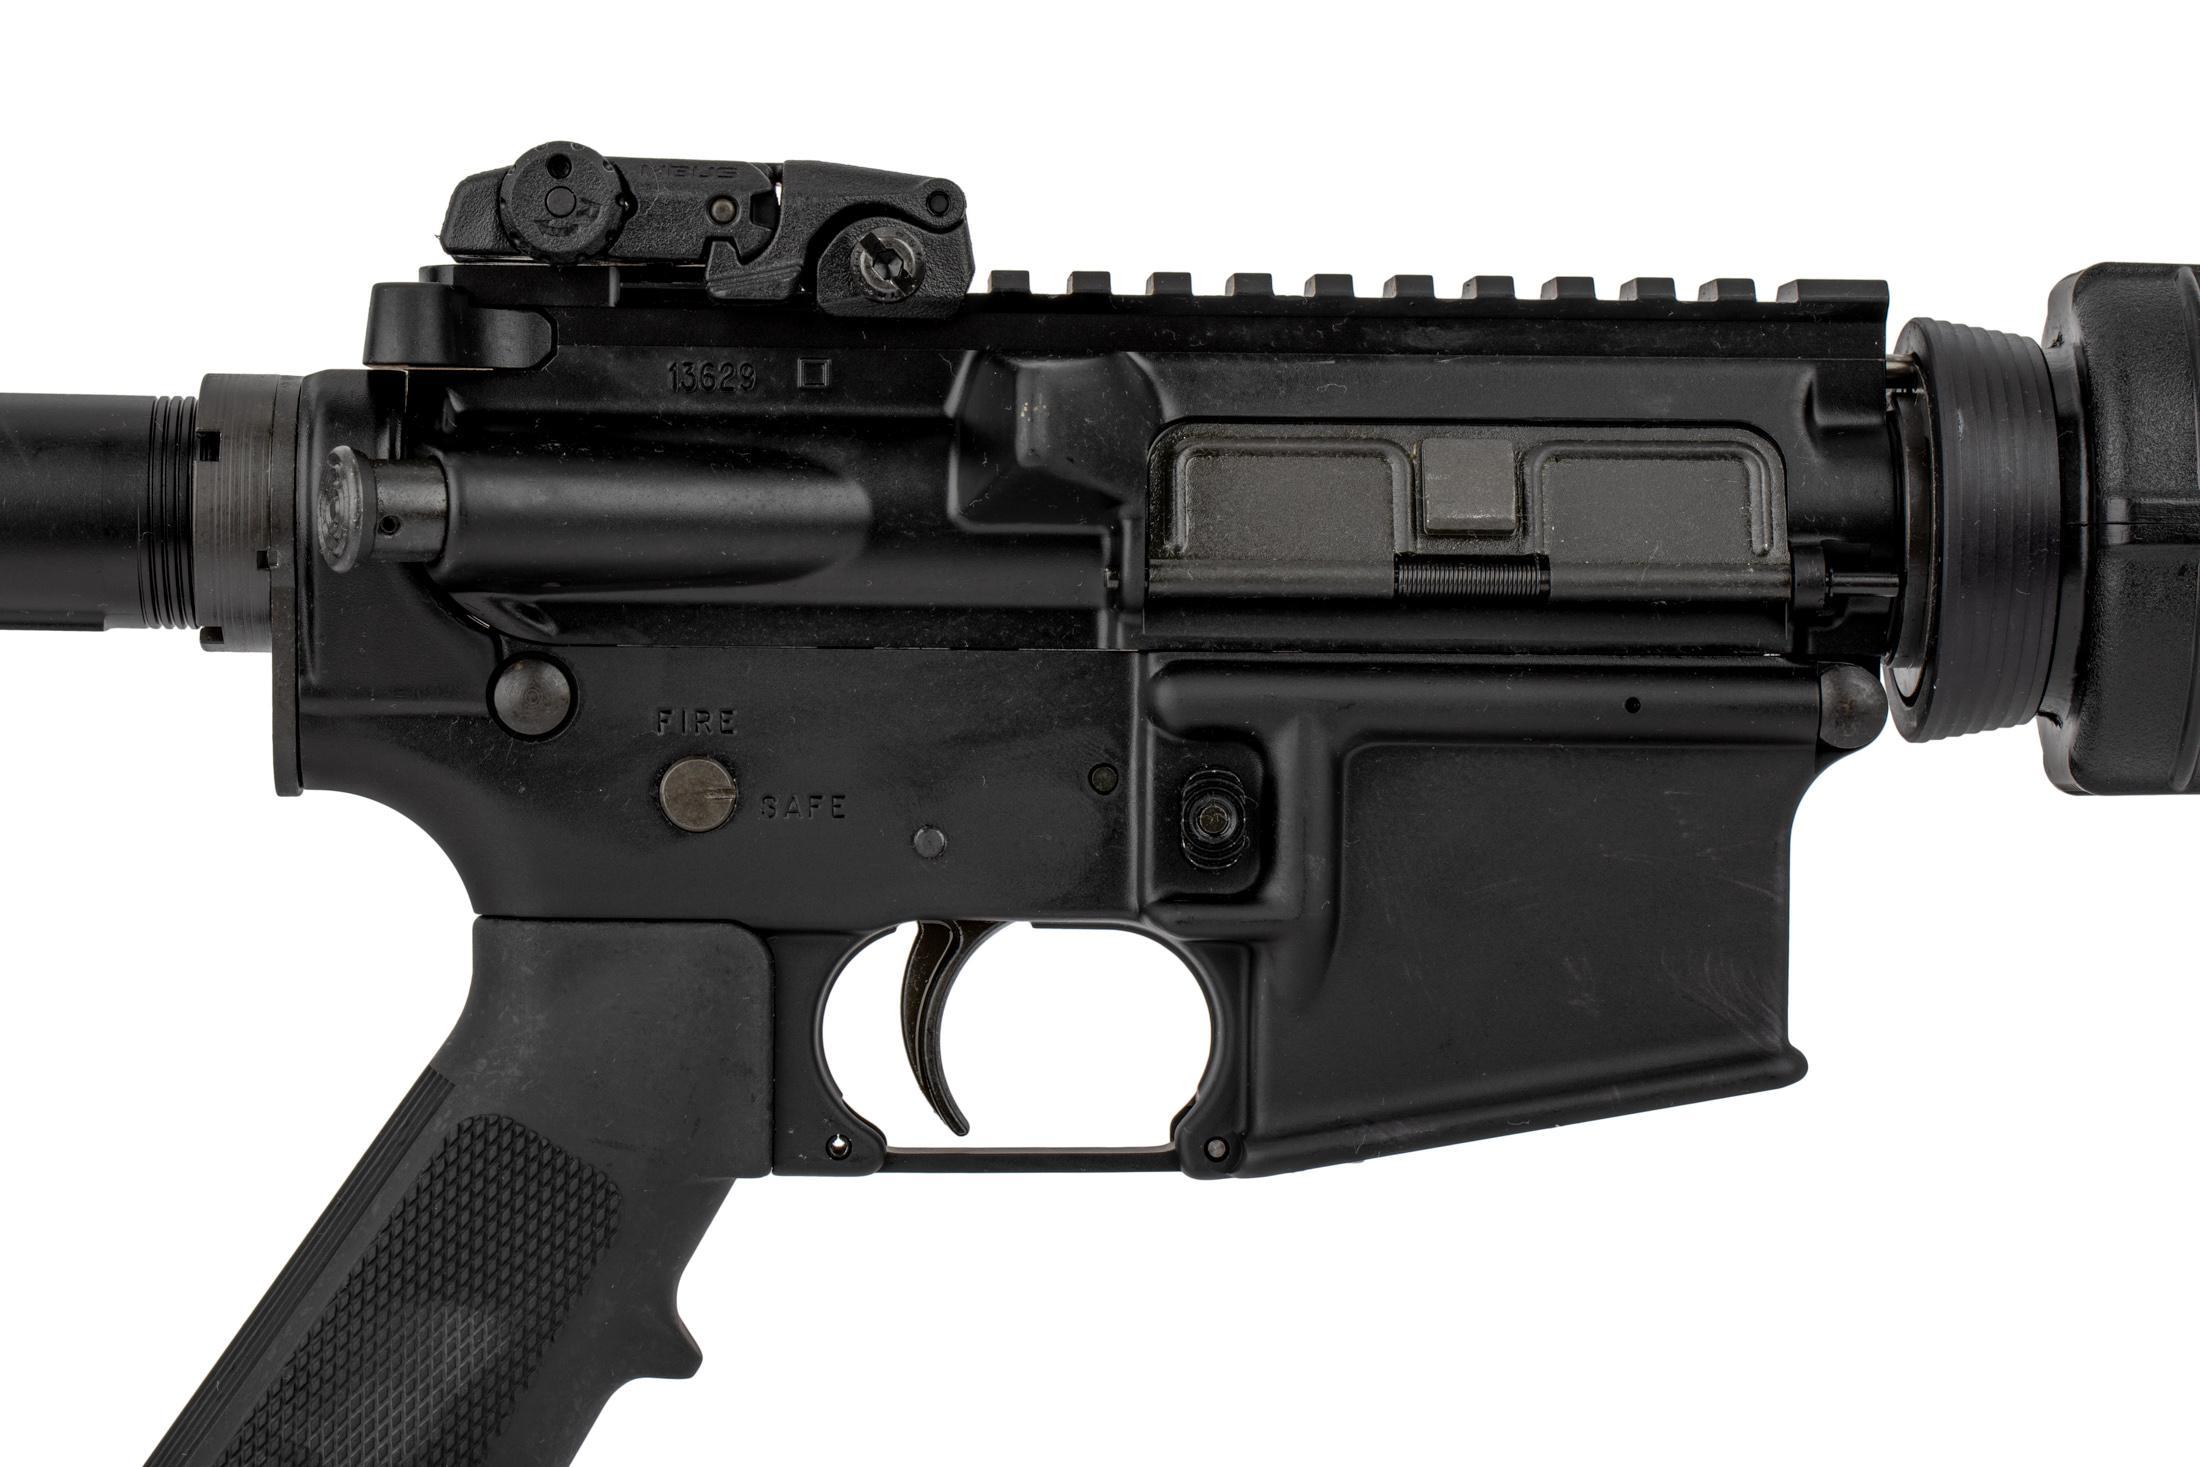 Colt 11 5